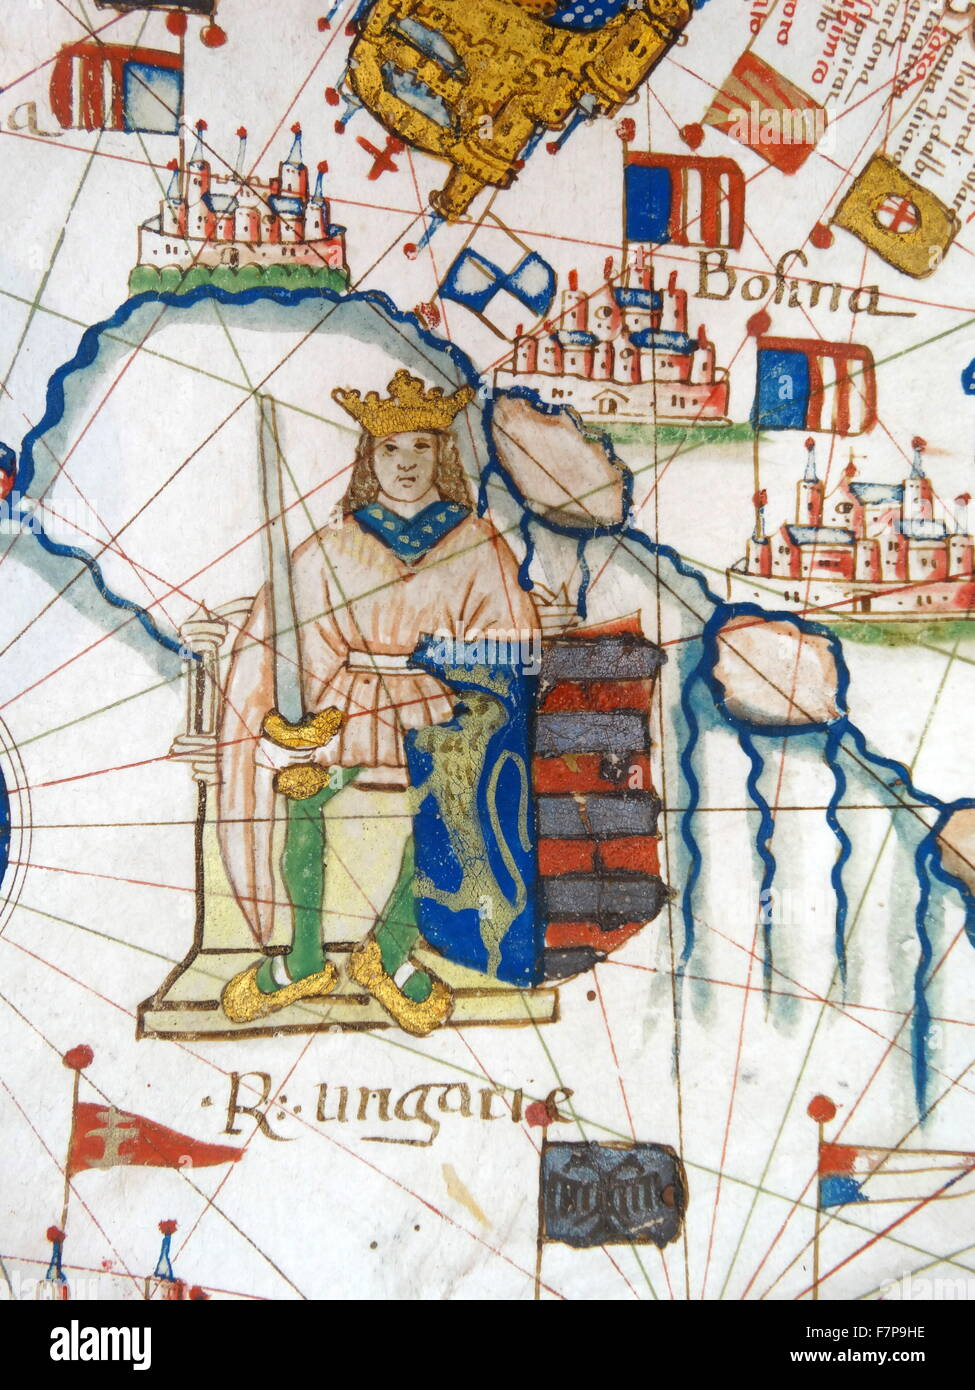 renaissance map of europe jacopo russo 1528 showing john